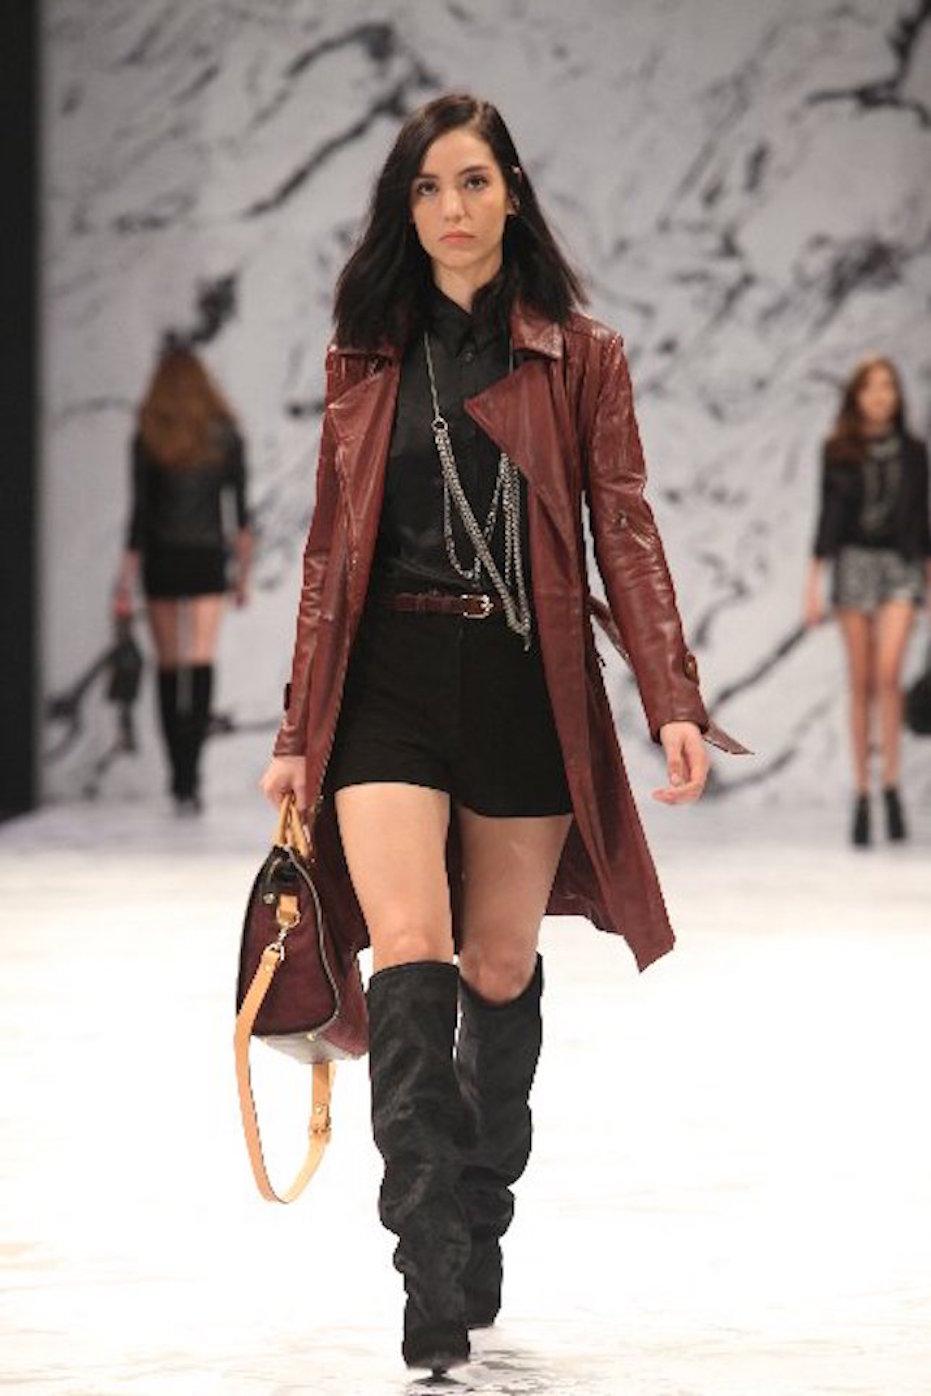 BAF Week Moda 2013 - Femeninas.com